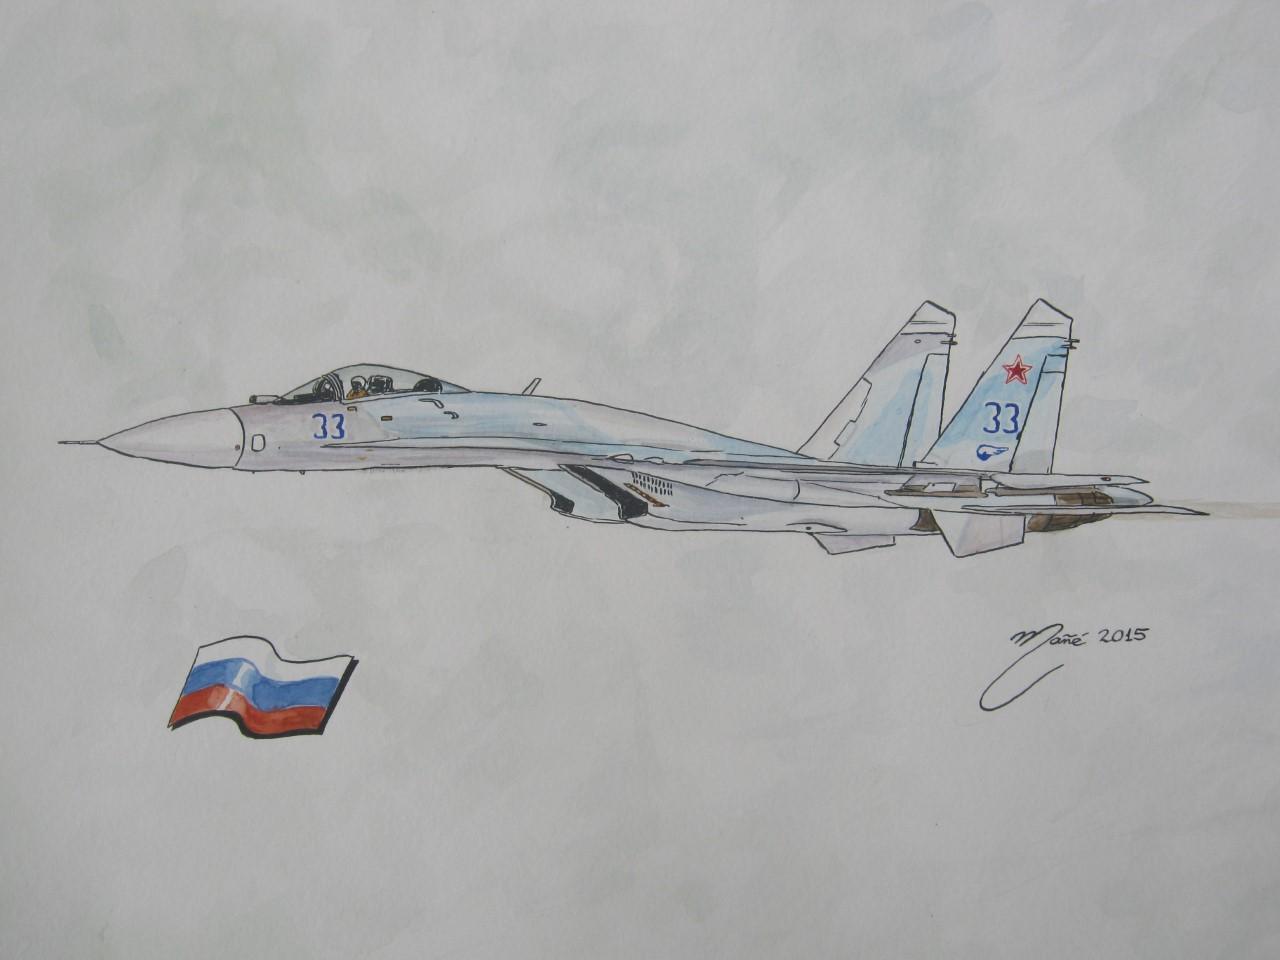 Combat aviation: Su-27 (NATO classification: Flanker)  A twin-engine